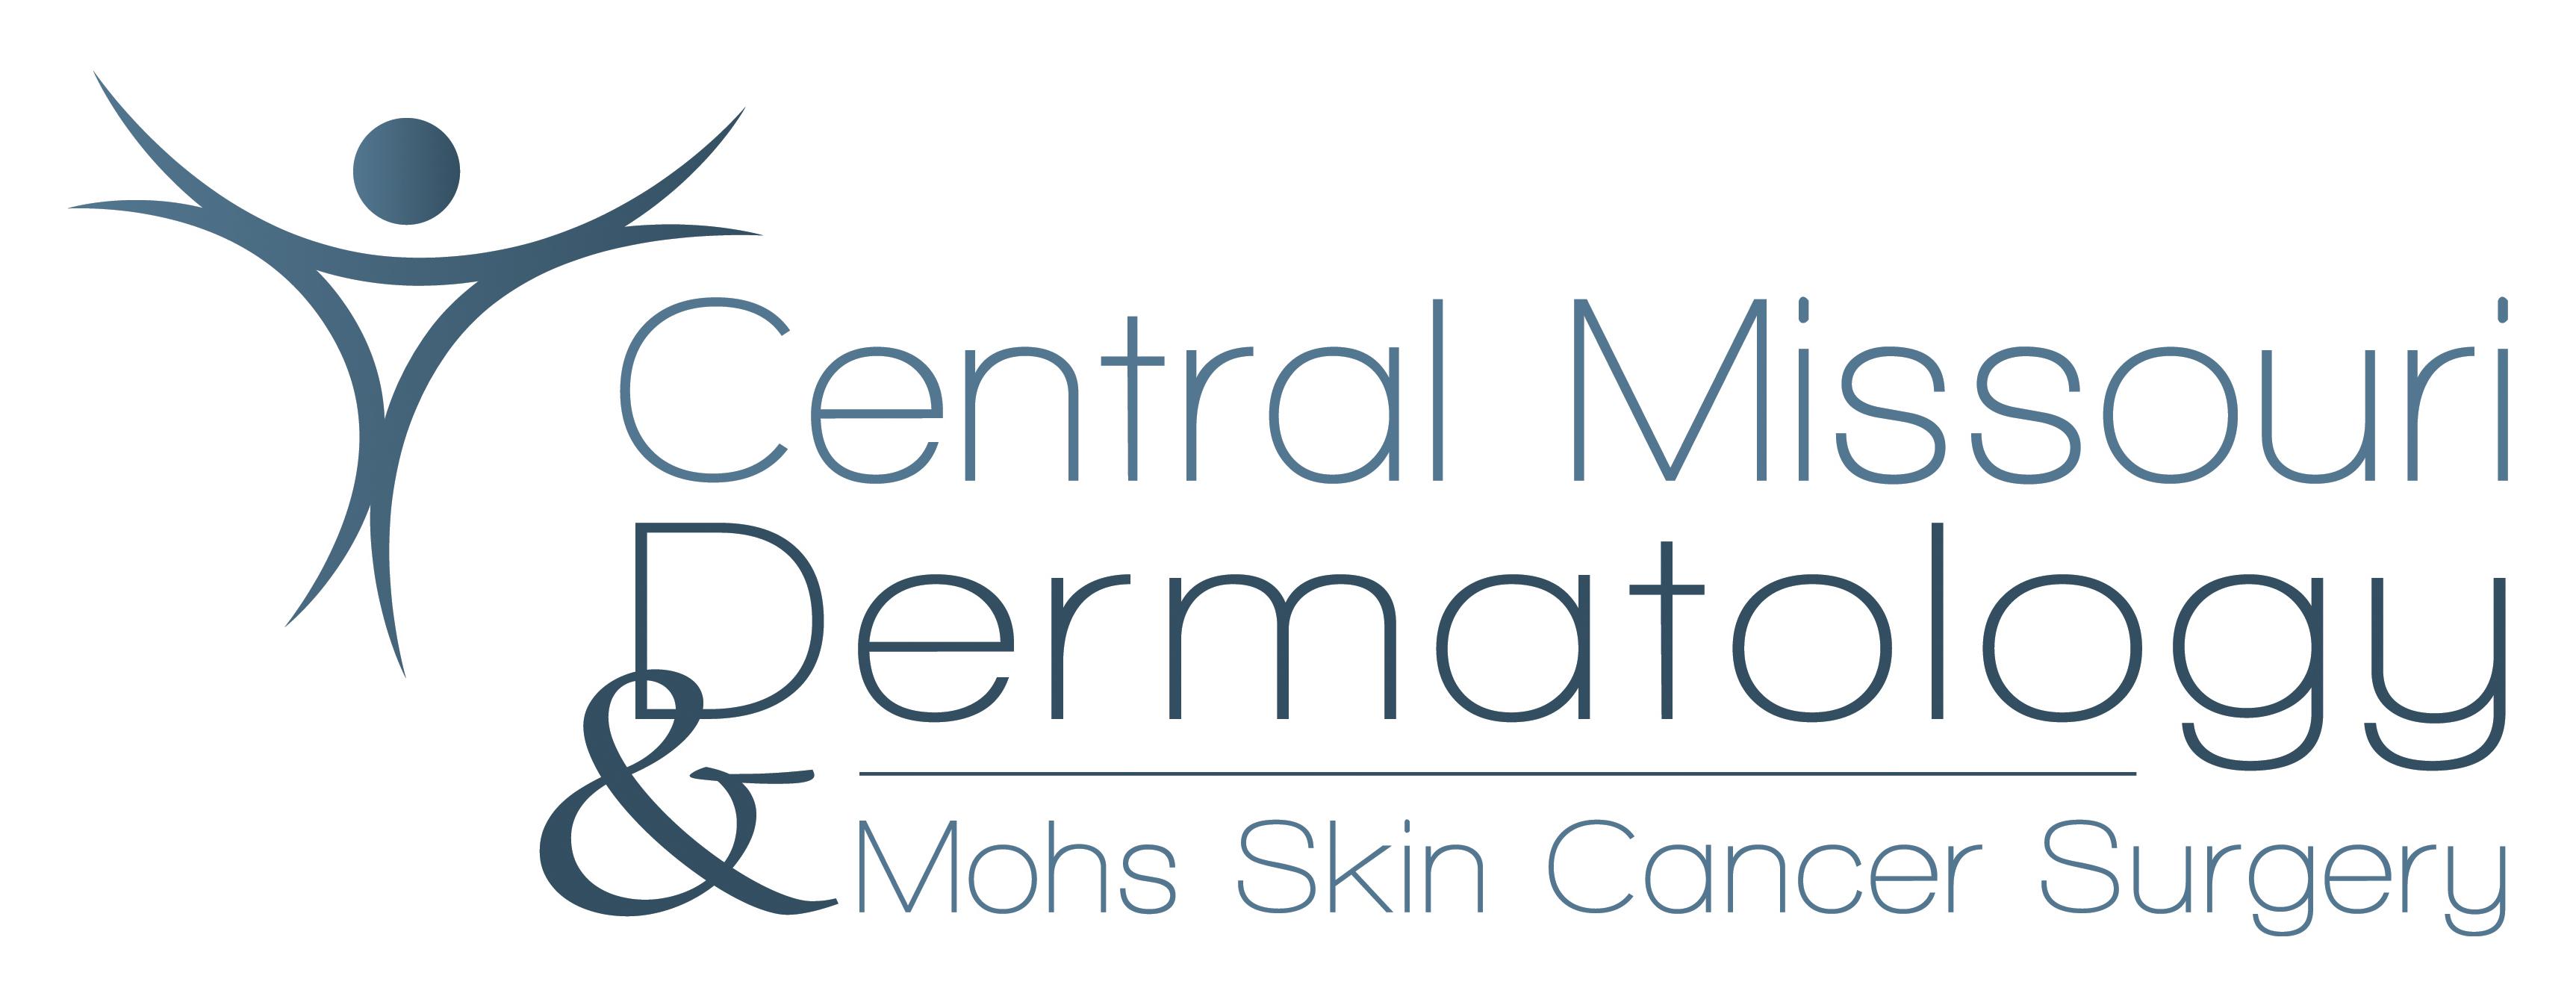 Central Missouri Dermatology Logo